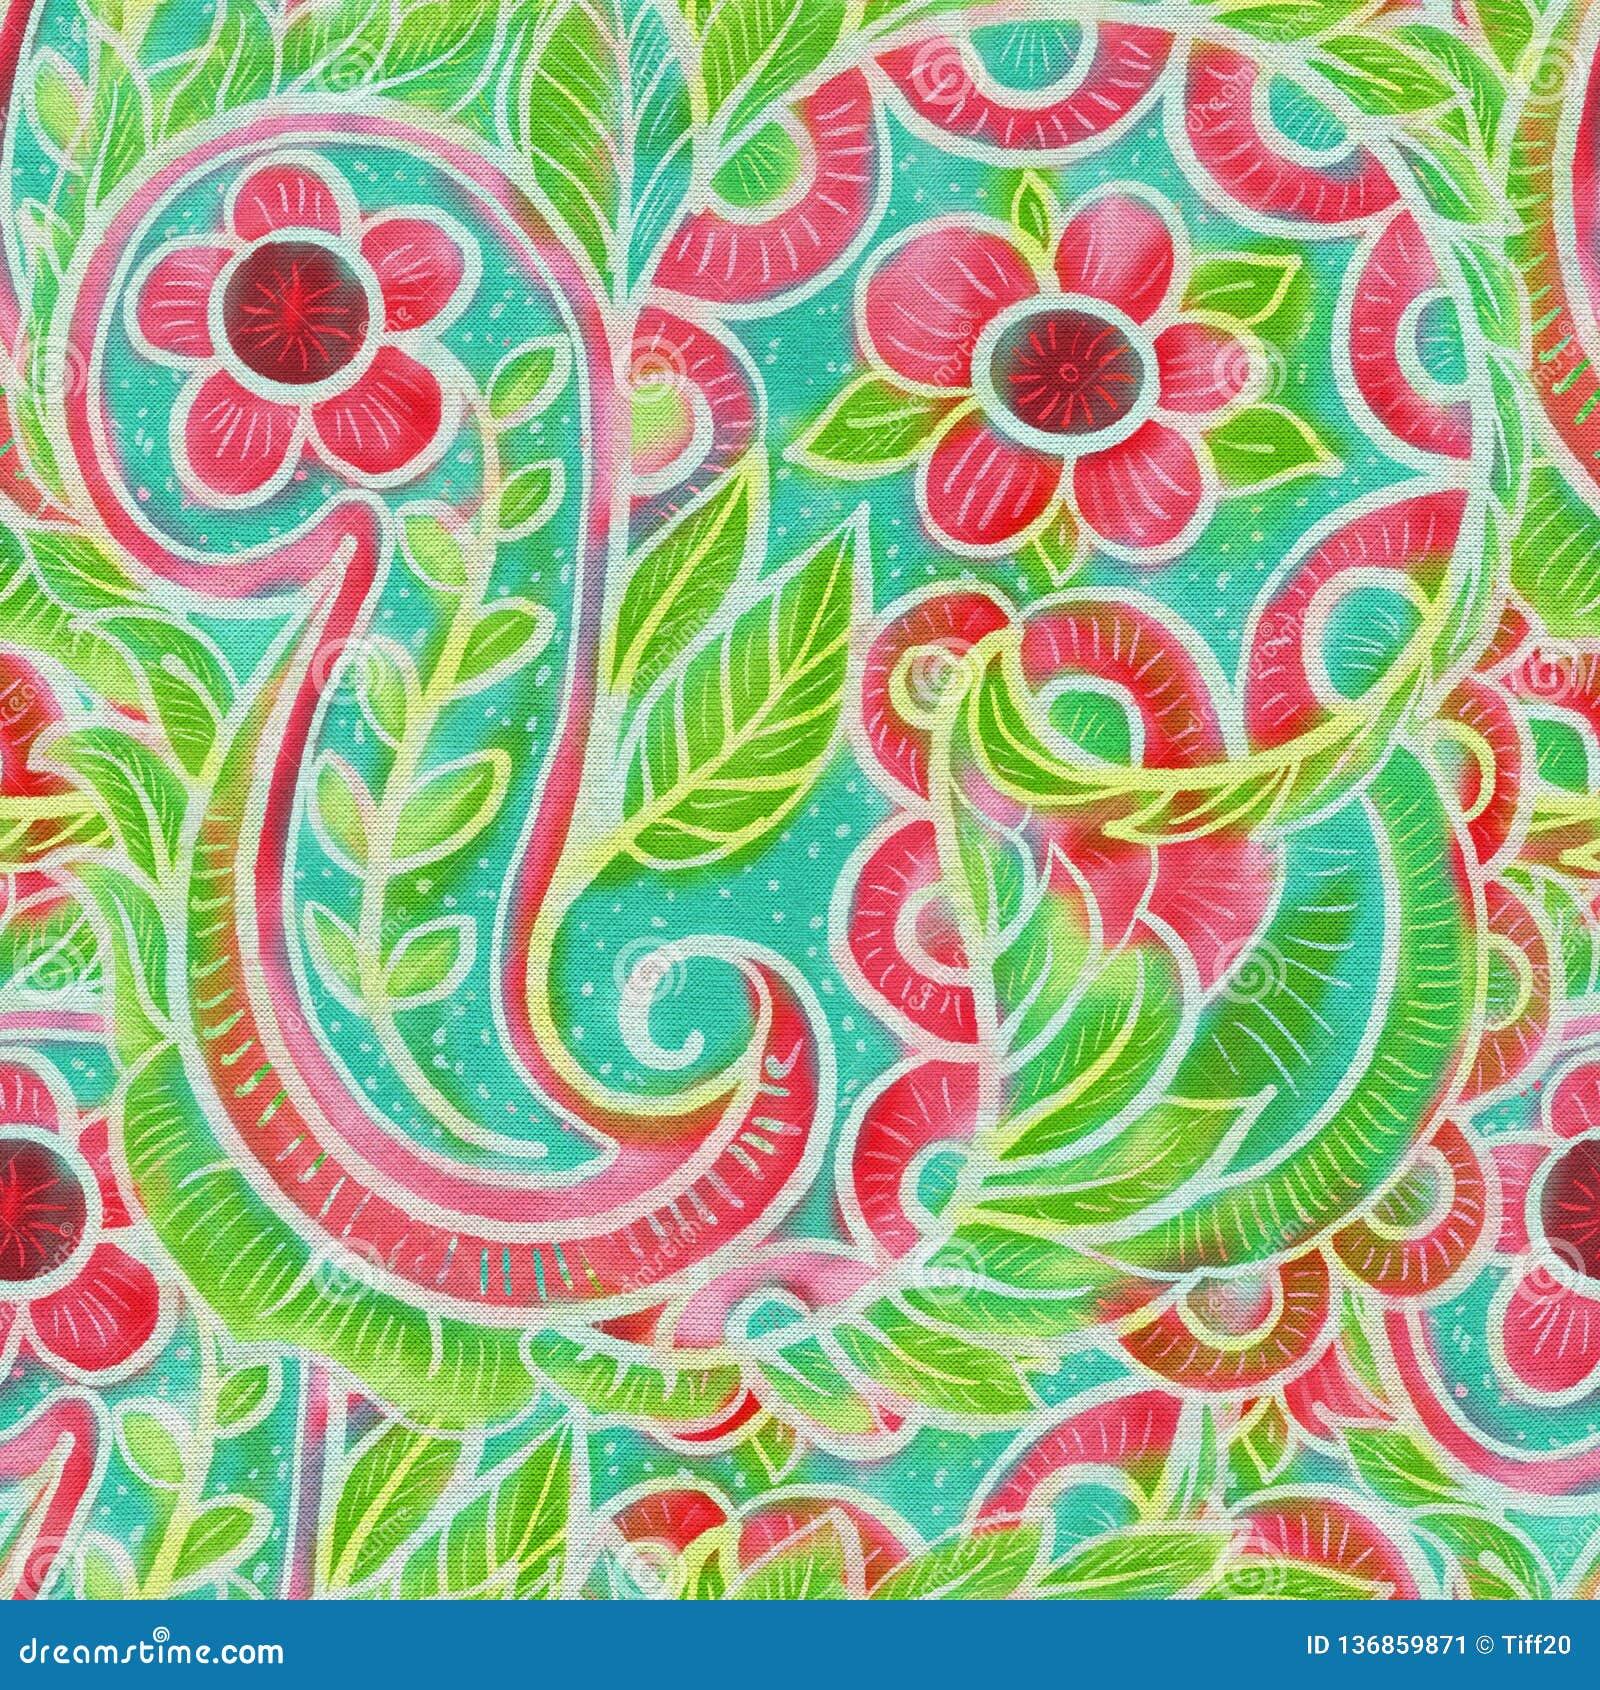 The Intricate Batik Pattern Stock Illustration